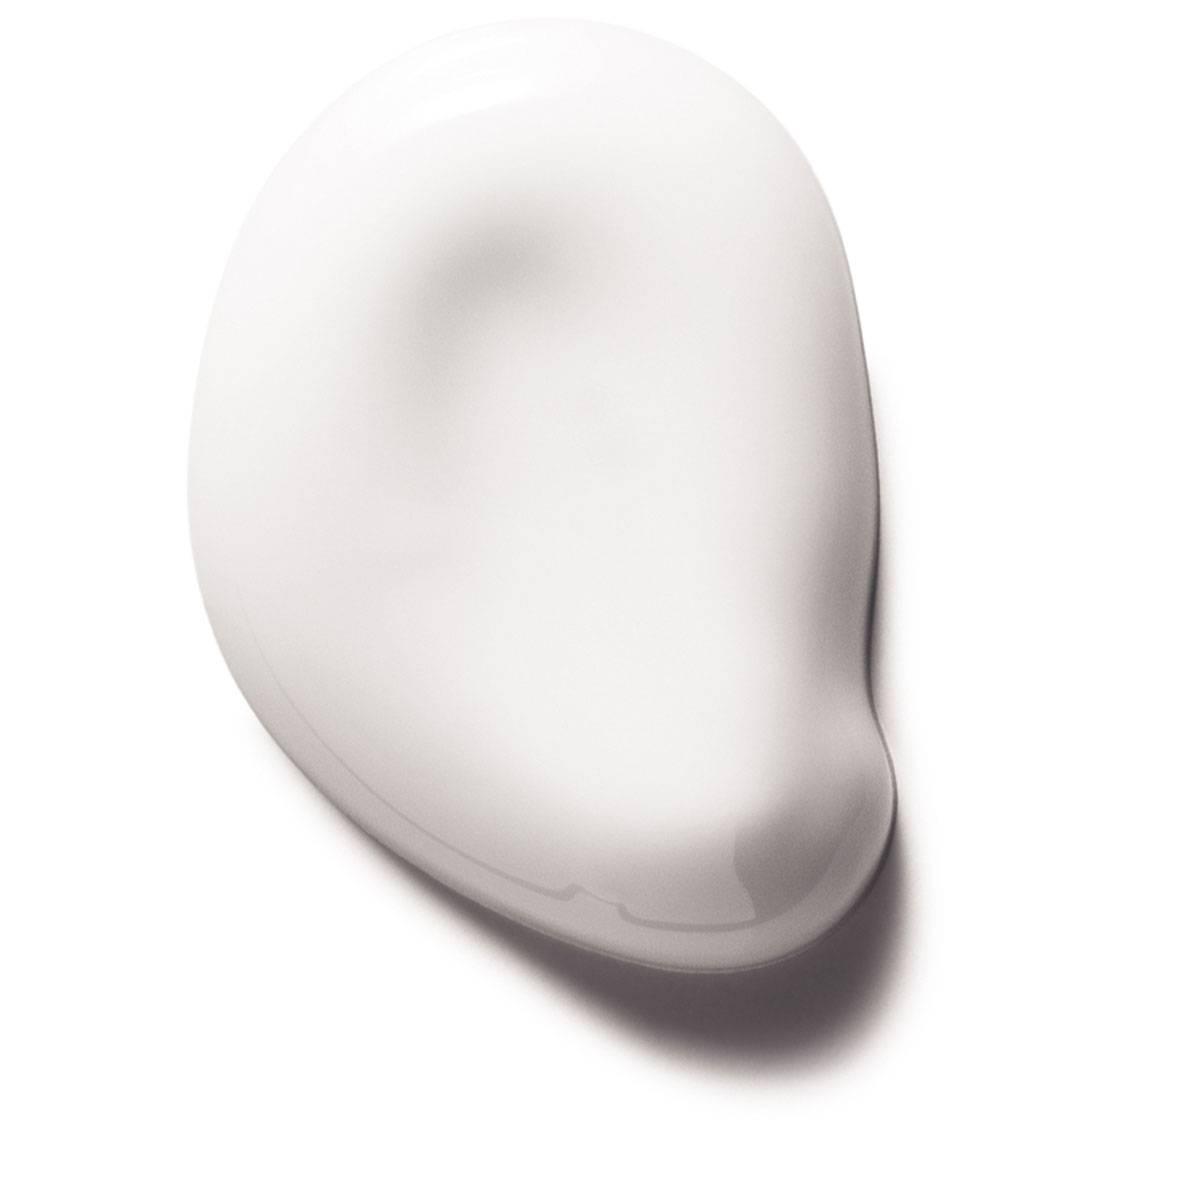 La Roche Posay Produktsida Hydraphase Rich Texture